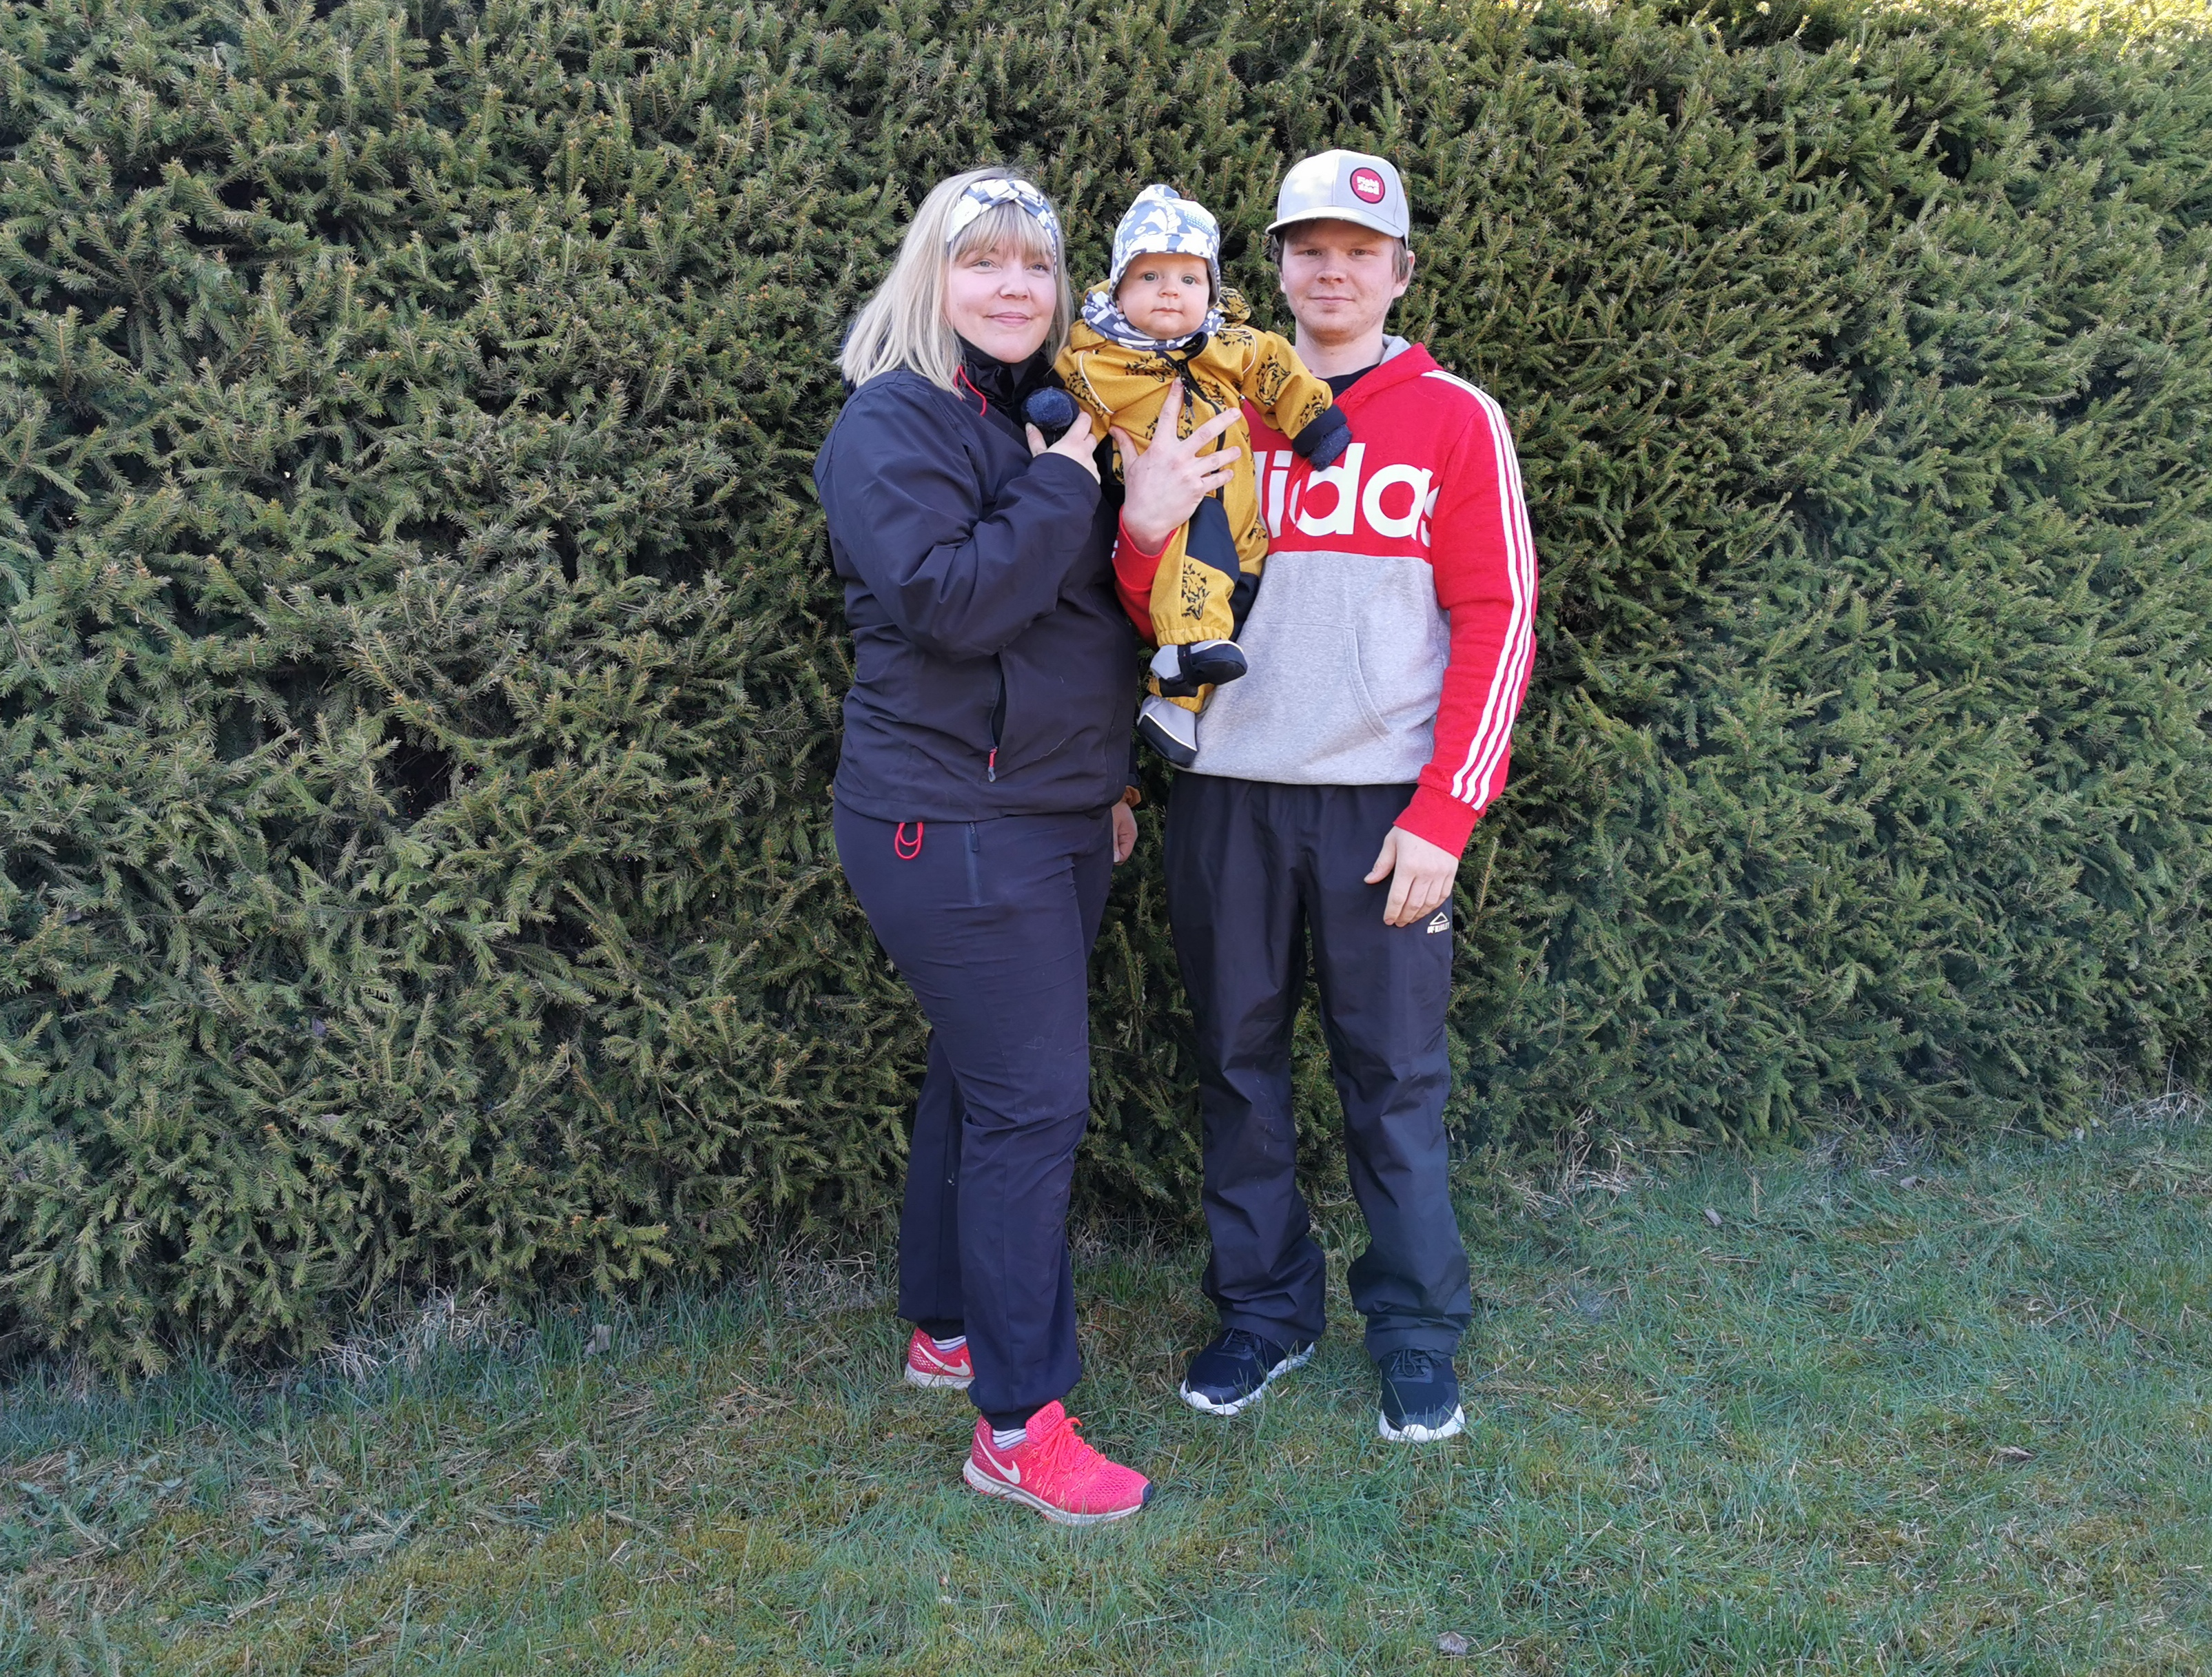 Ida Vigren ja Aku Jokela perheineen